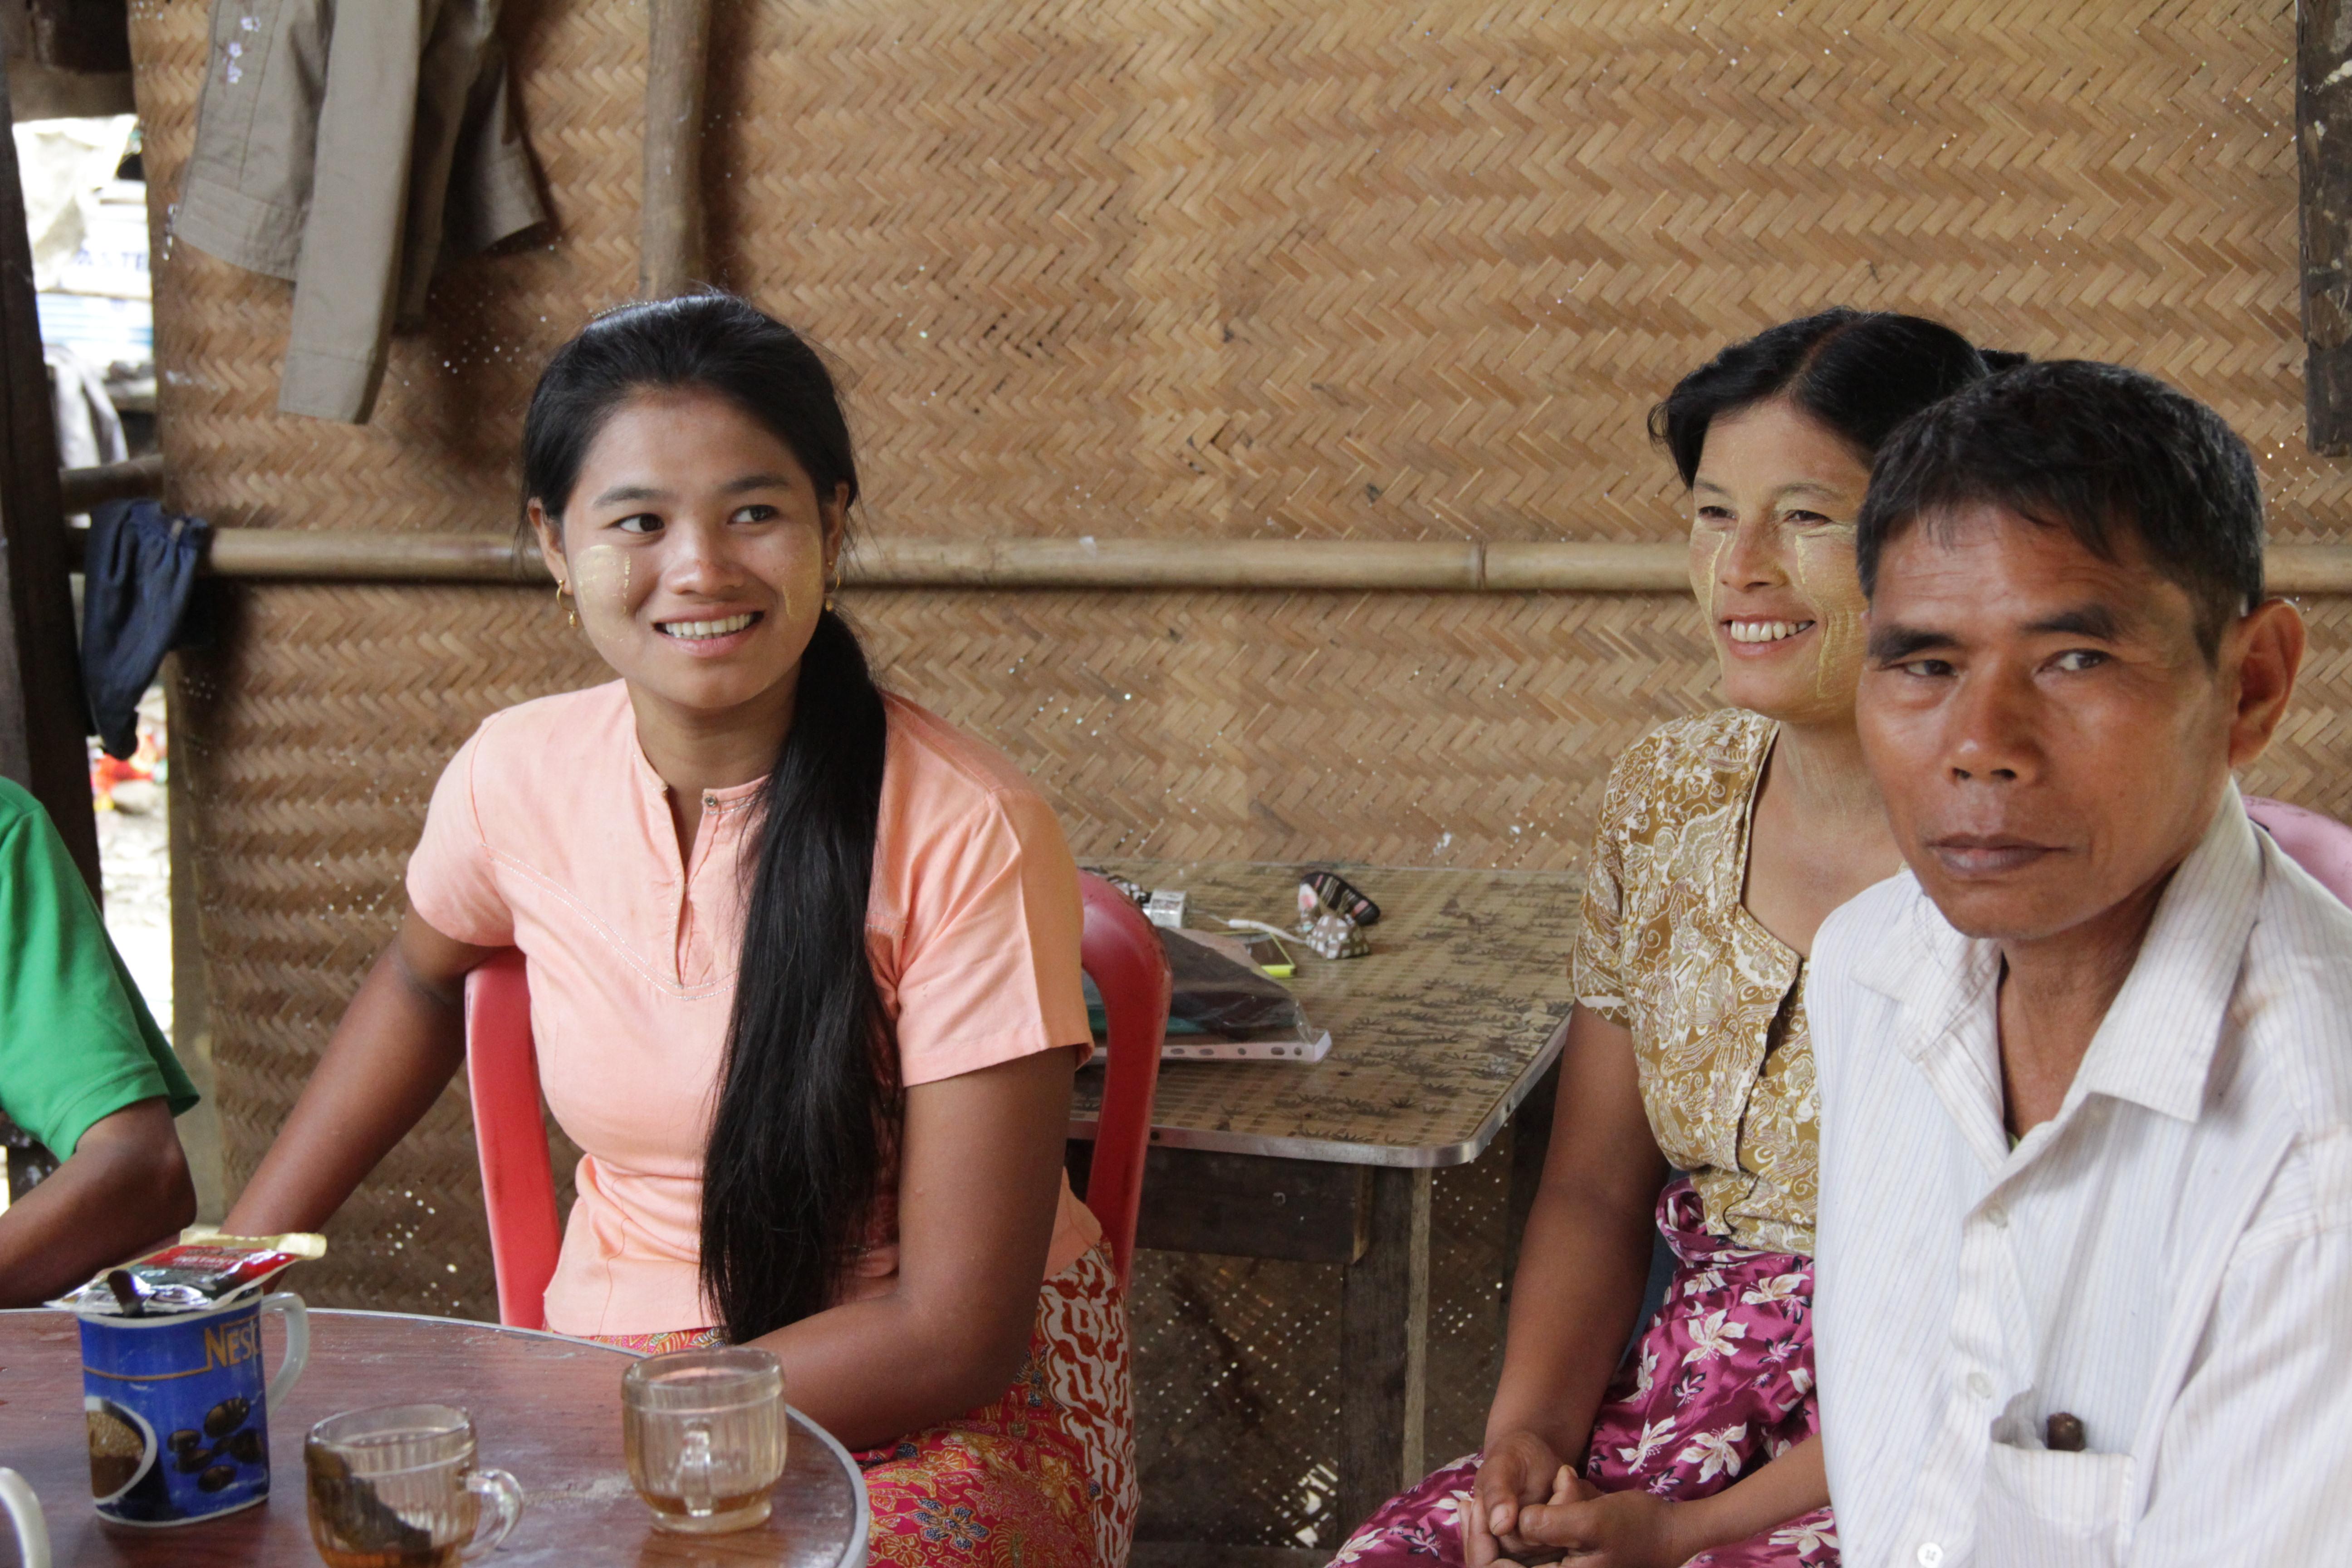 Khin Khin Chan, a village woman from Thit Pote Taung village in Kyauk Phyu, Rakhine State. Photo by: Yu Lwin Soe/ Oxfam